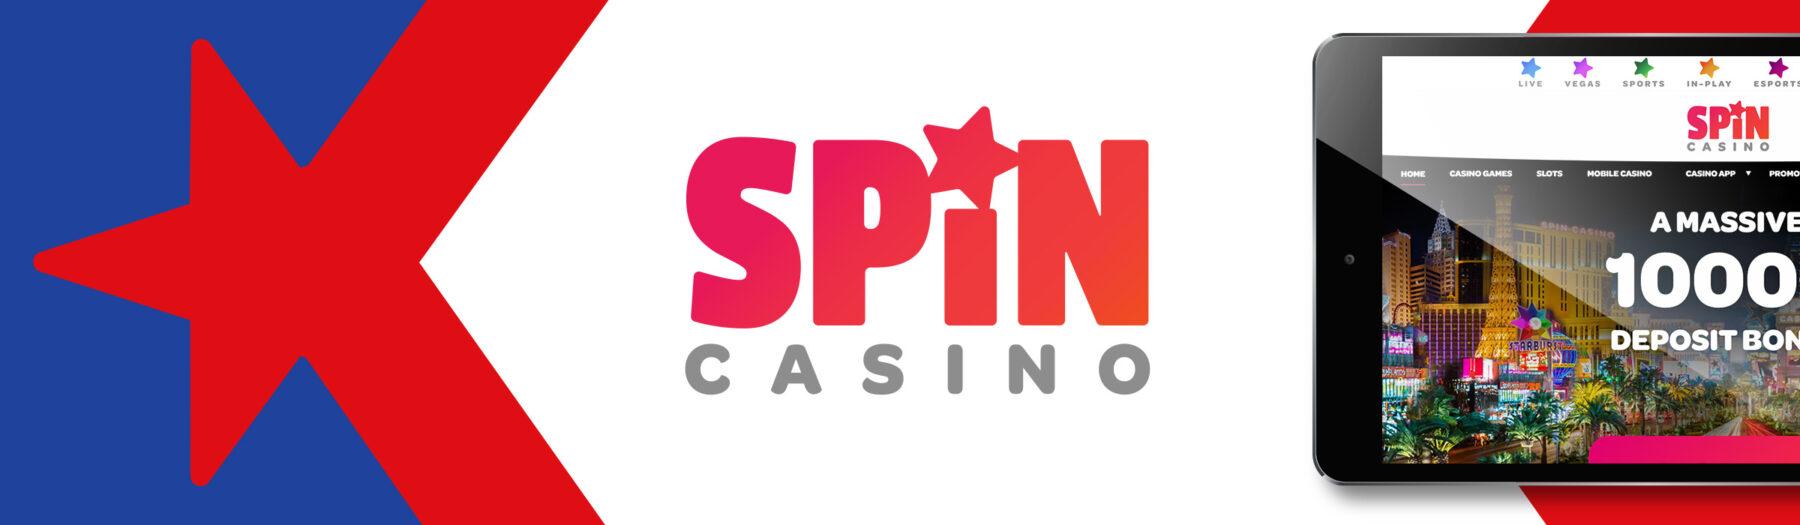 Bonos Casino en Spin